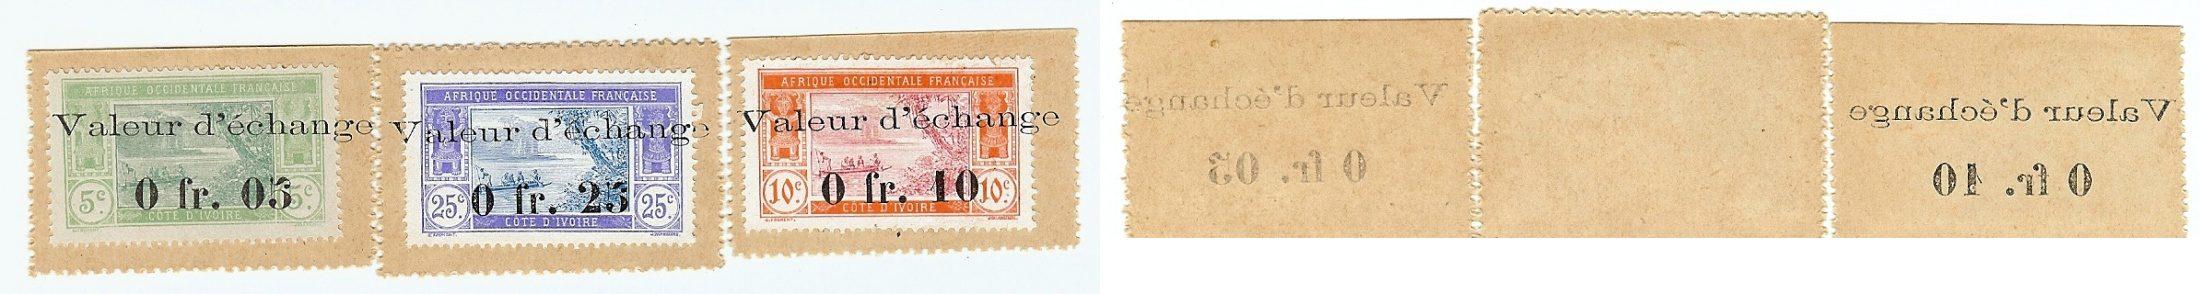 0,05,0,010,0,025 Francs 1920 Ivory Coast unz